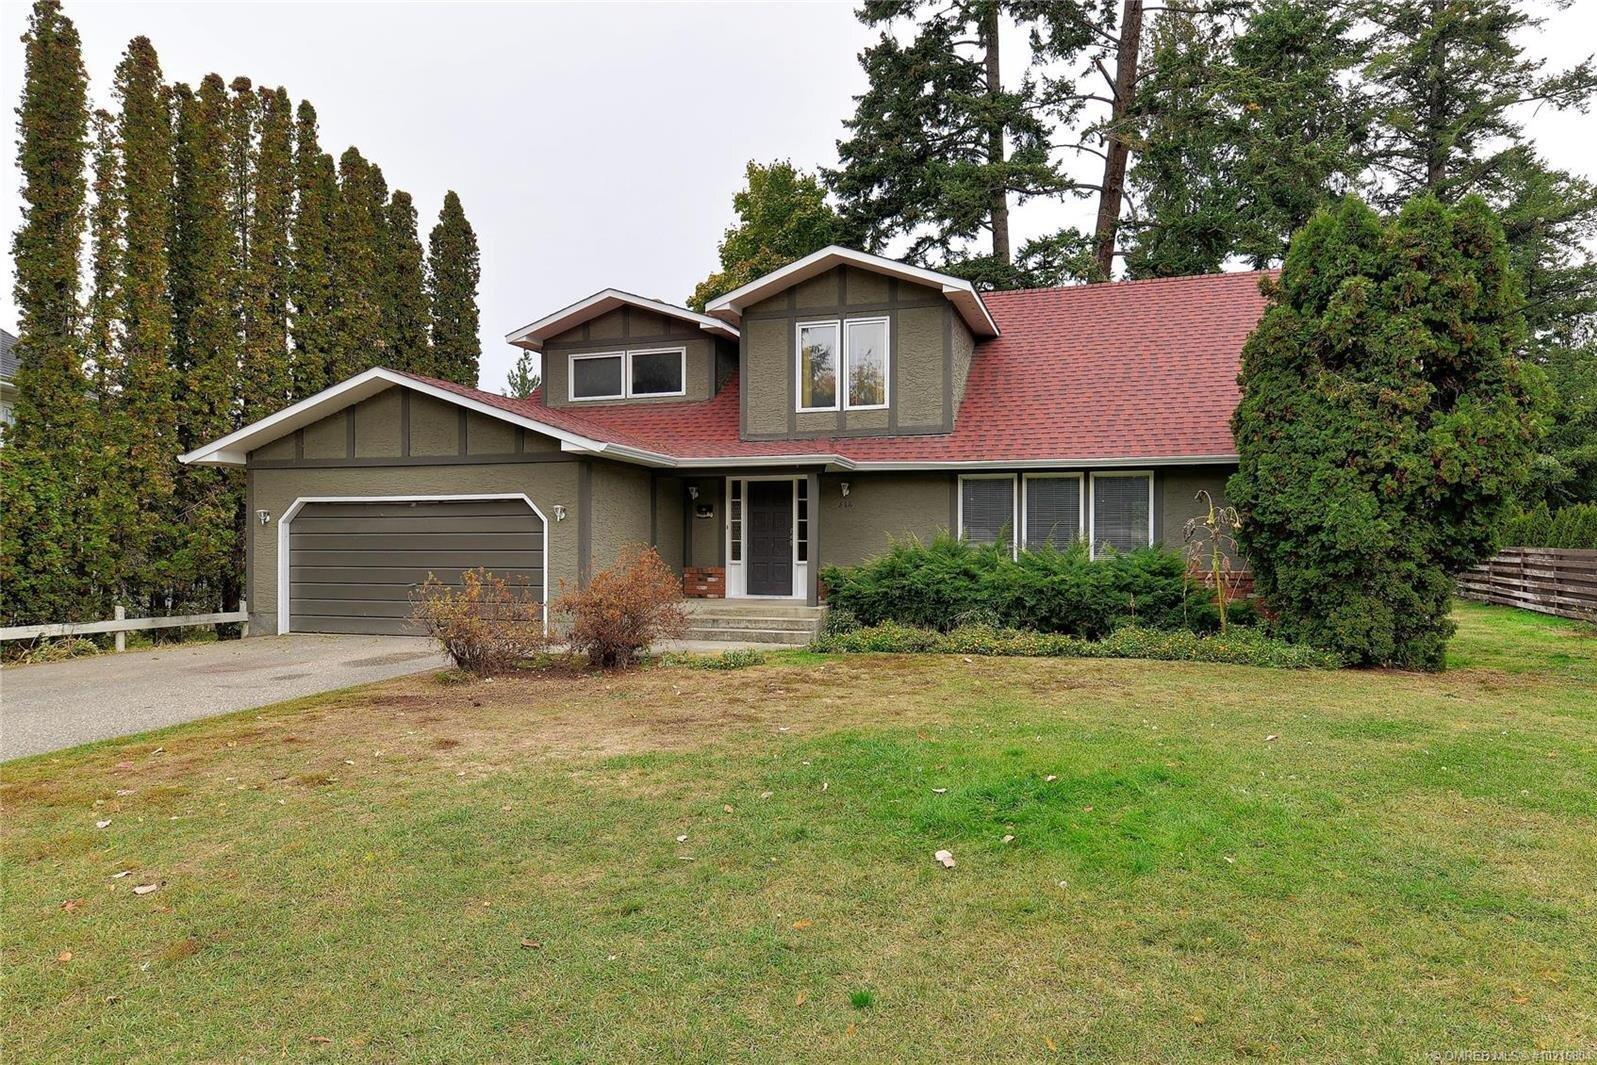 House for sale at 514 Keith Rd Kelowna British Columbia - MLS: 10216804